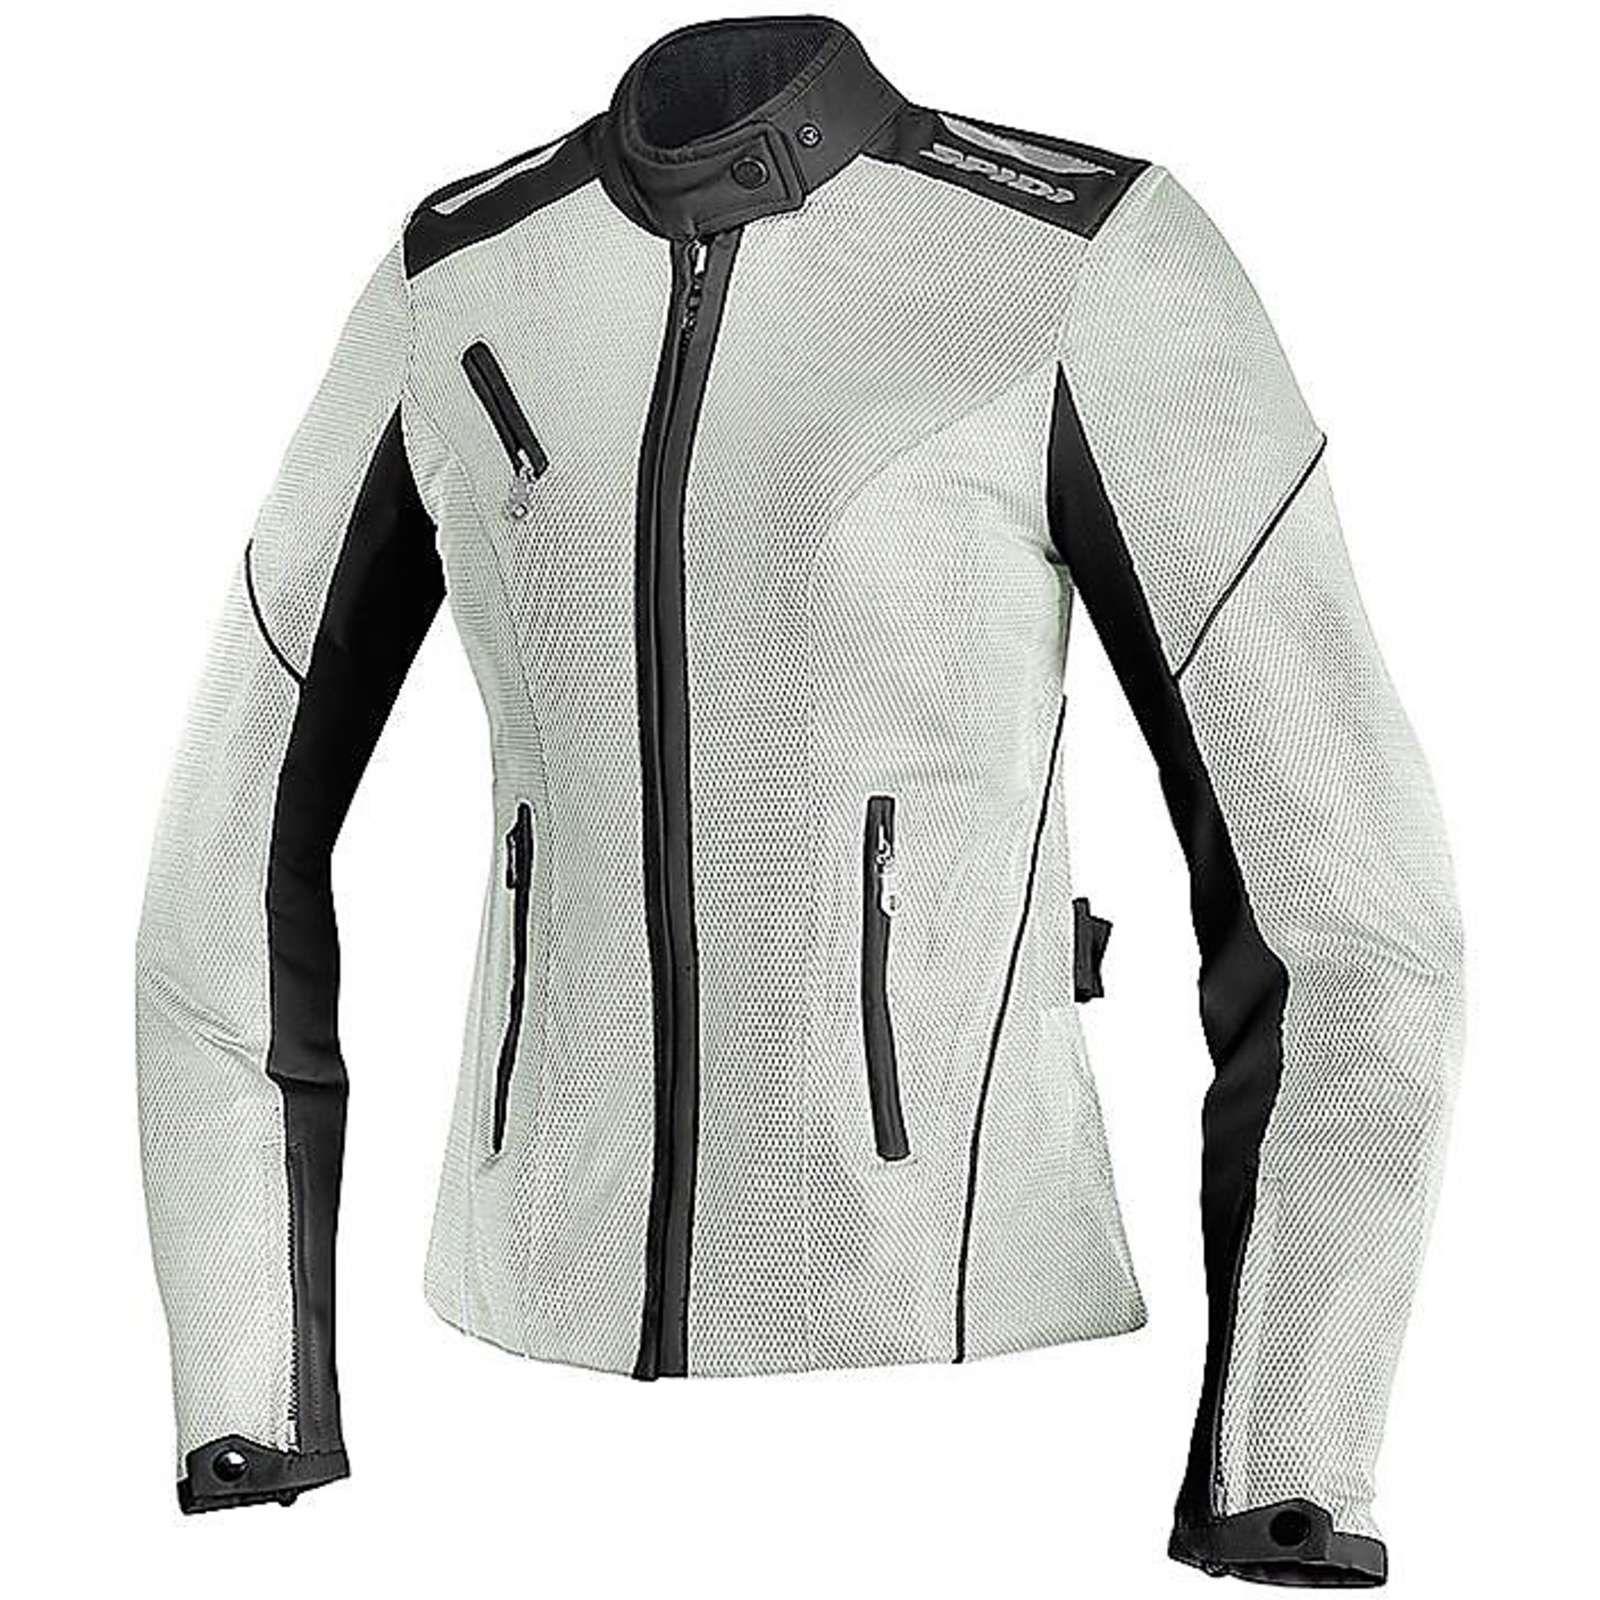 Netix Woman Jacket Jackets Cloth Spidi dainese motorcycle